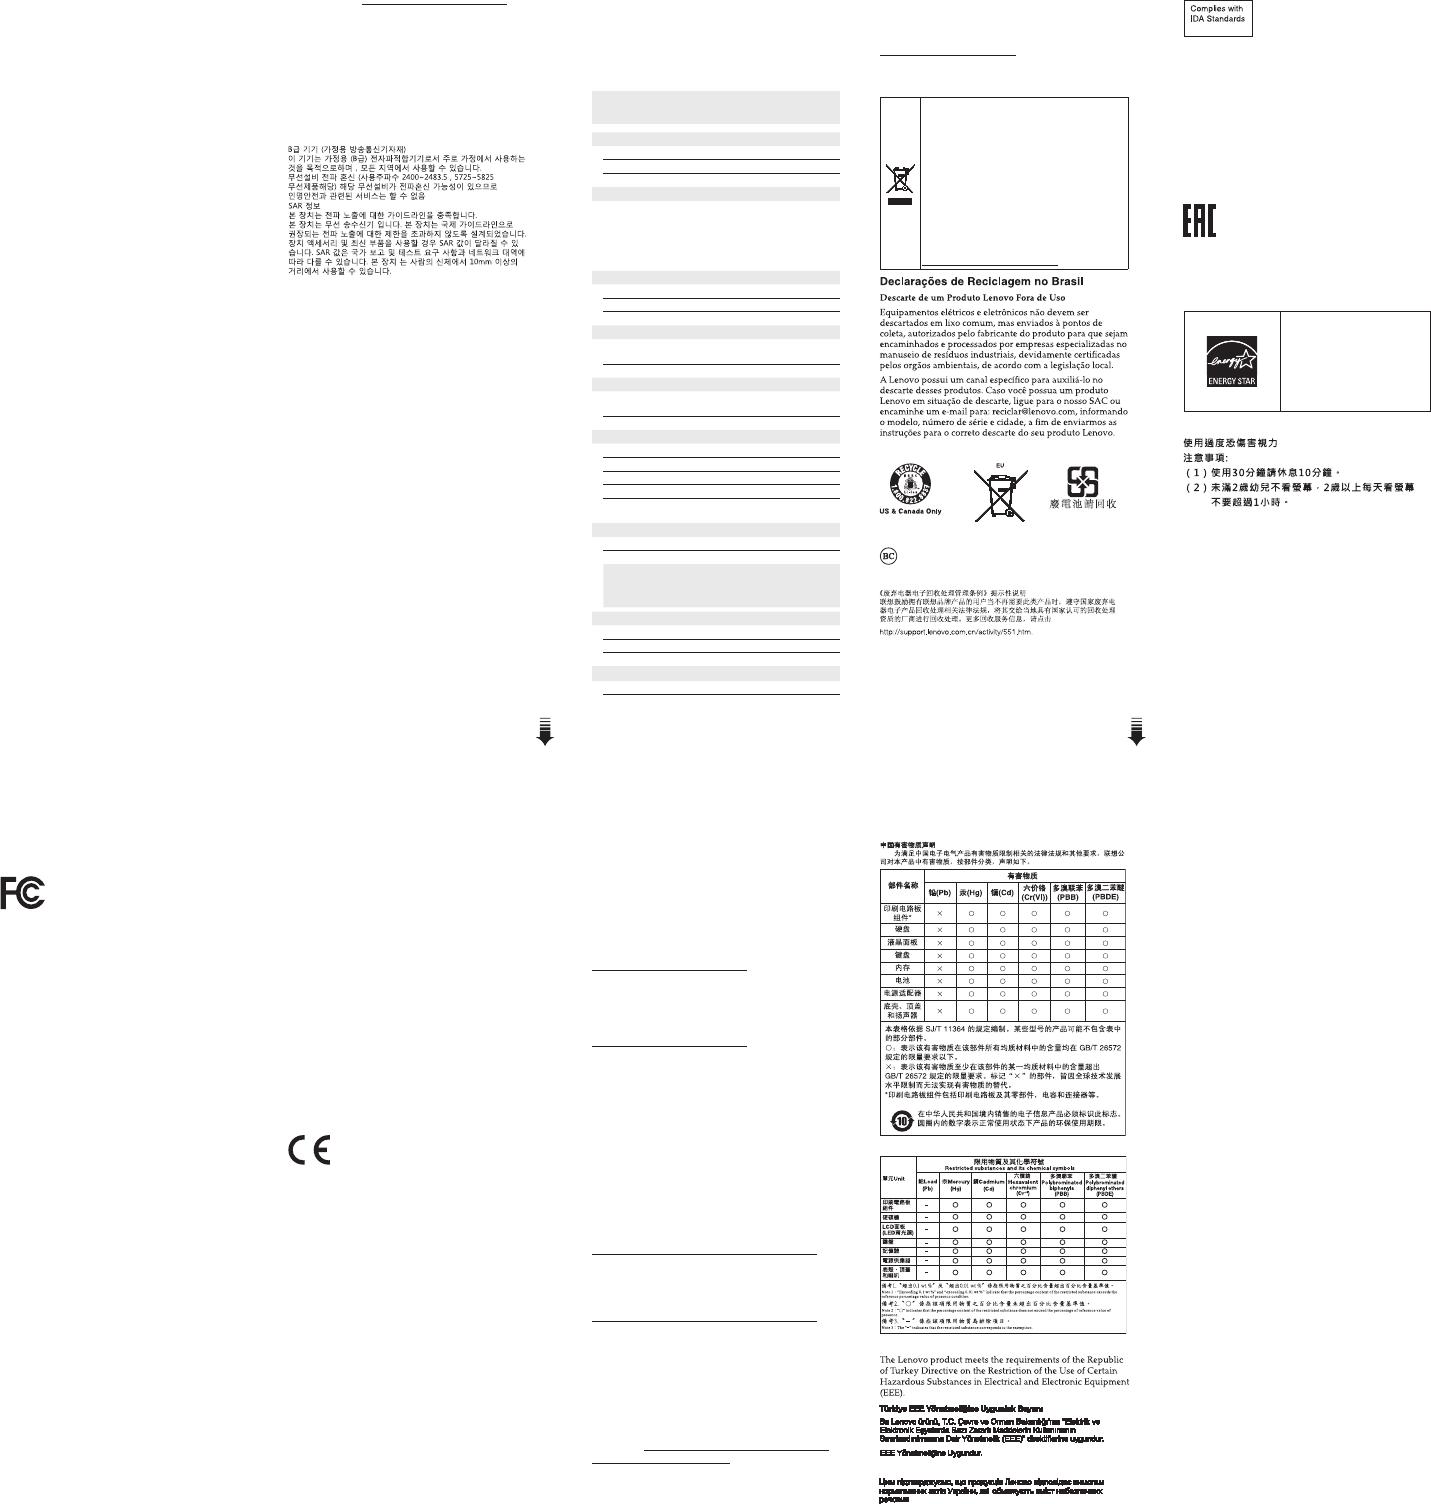 Lenovo Ideapad320S 14Ikb 320Sx 520S 520Sx Swsg Ja 201704